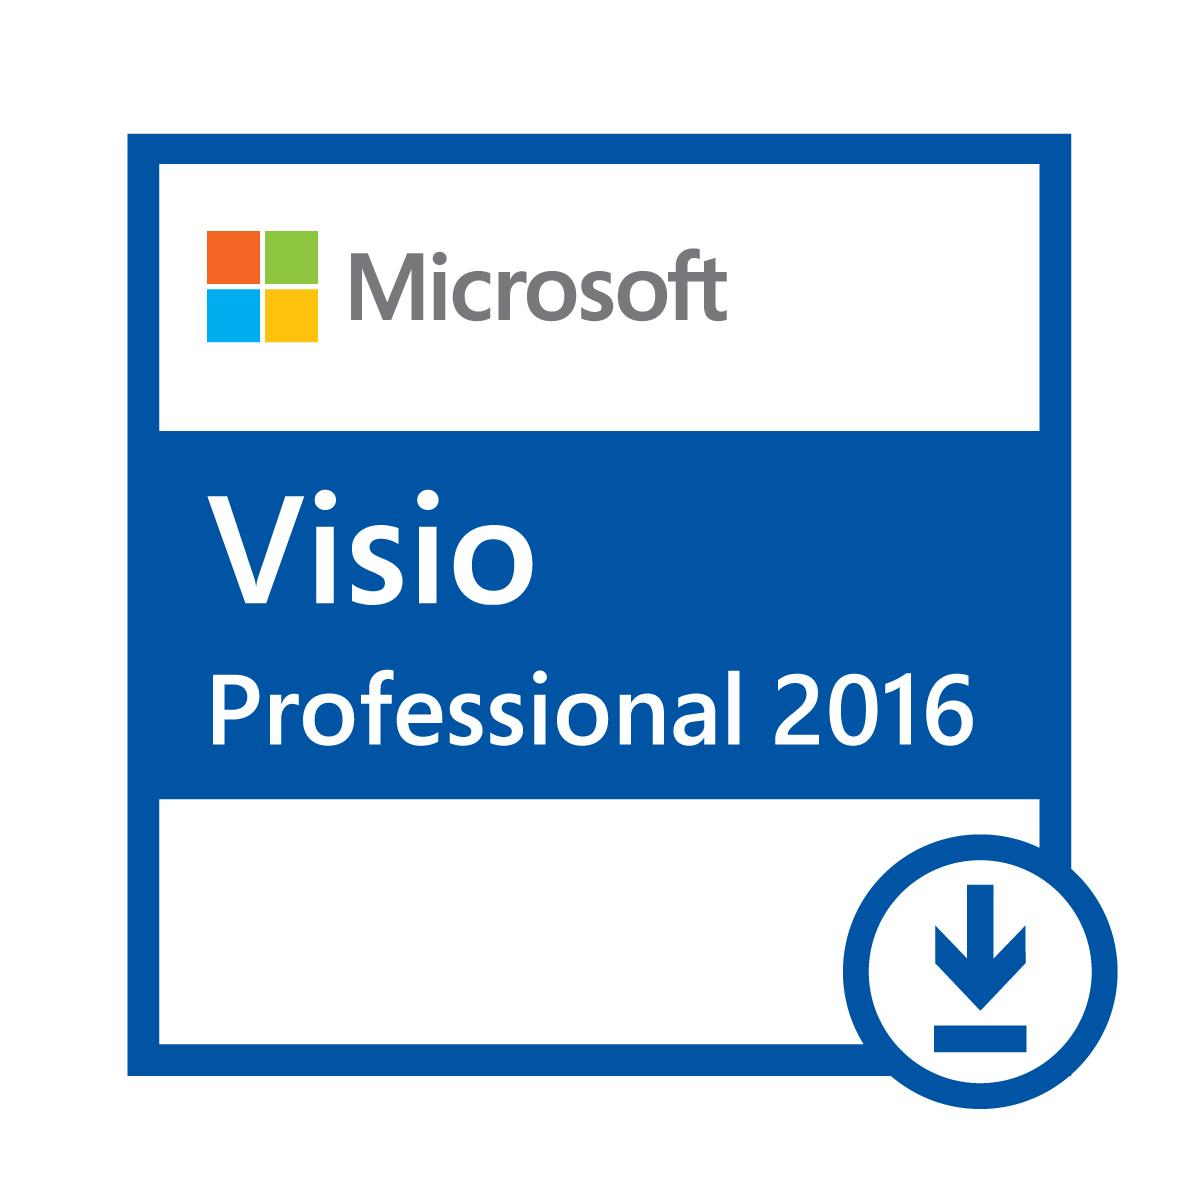 visio 2016 trial information visio2b20162bprofessional visio 2016 trialawp ms visio standard 2016 30day ms visio standard 2016 30day - Visio 30 Day Trial